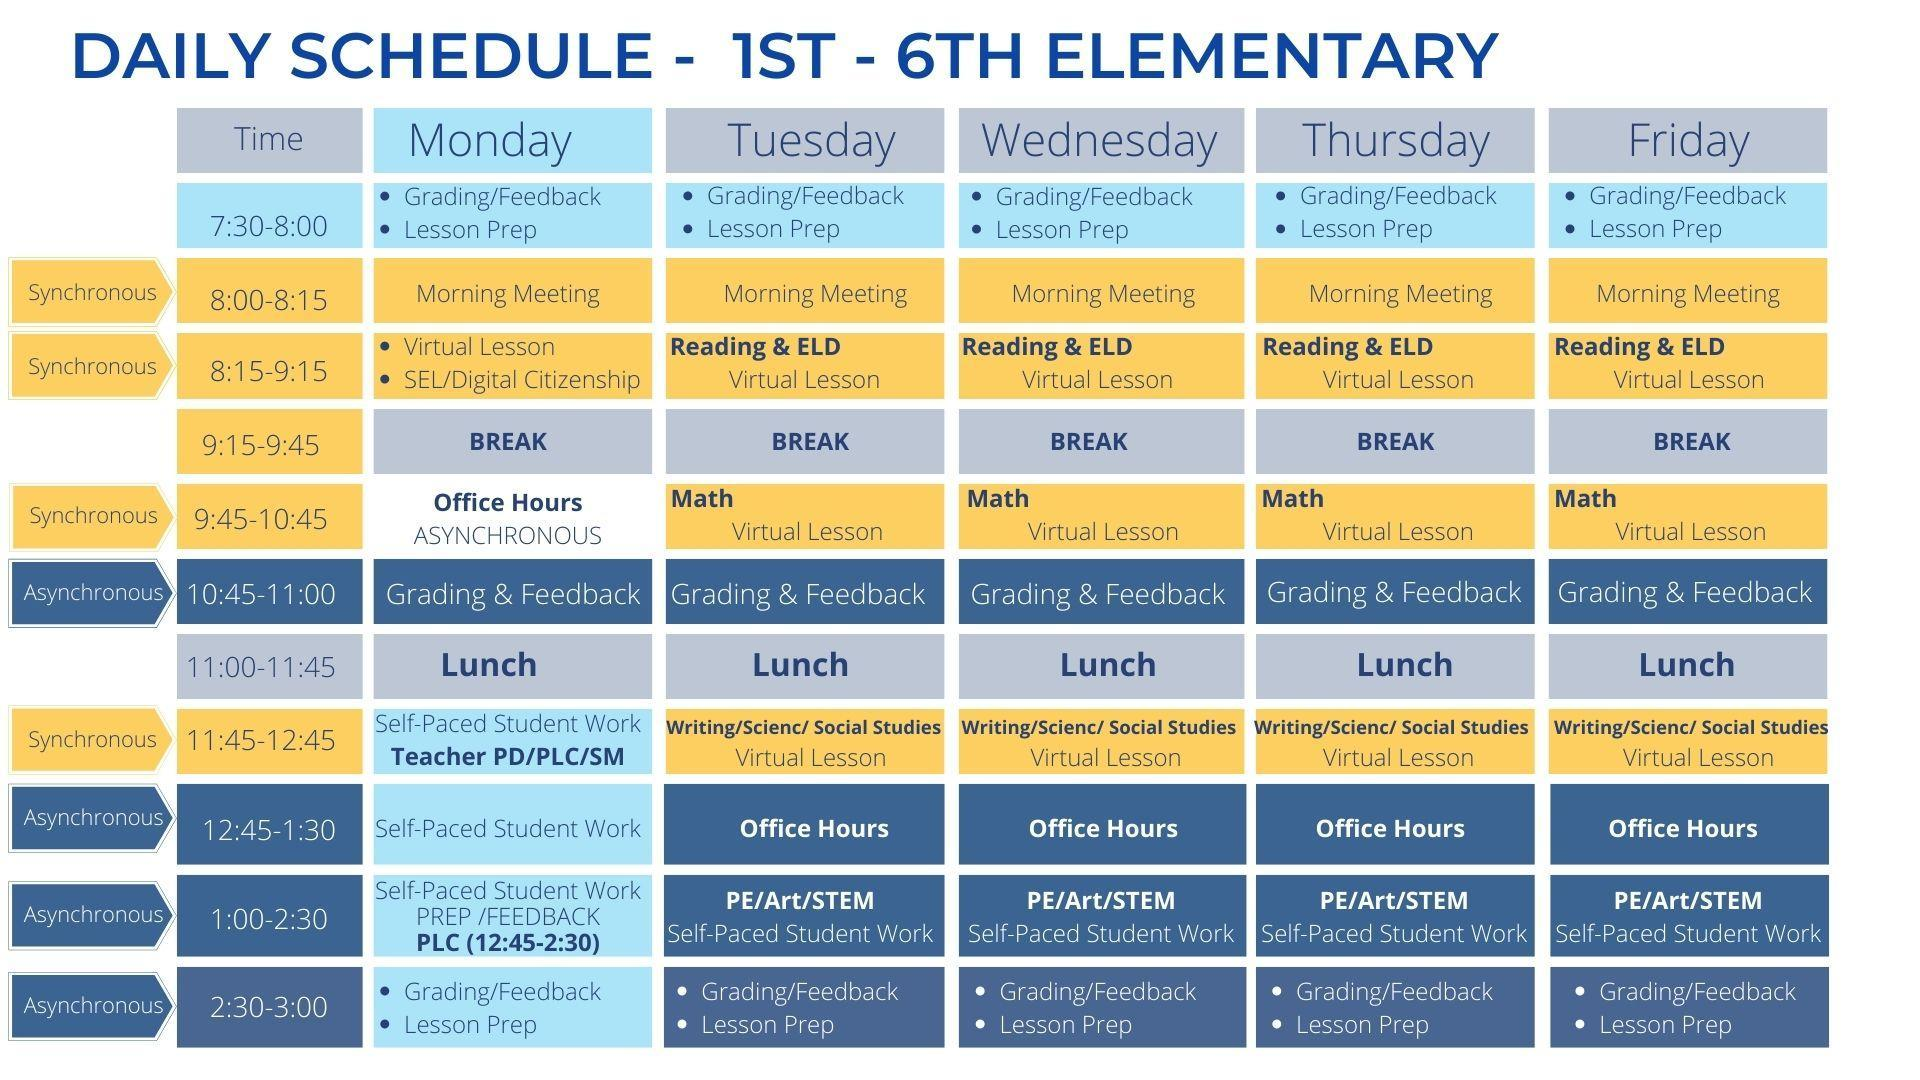 1st-6th Elementary